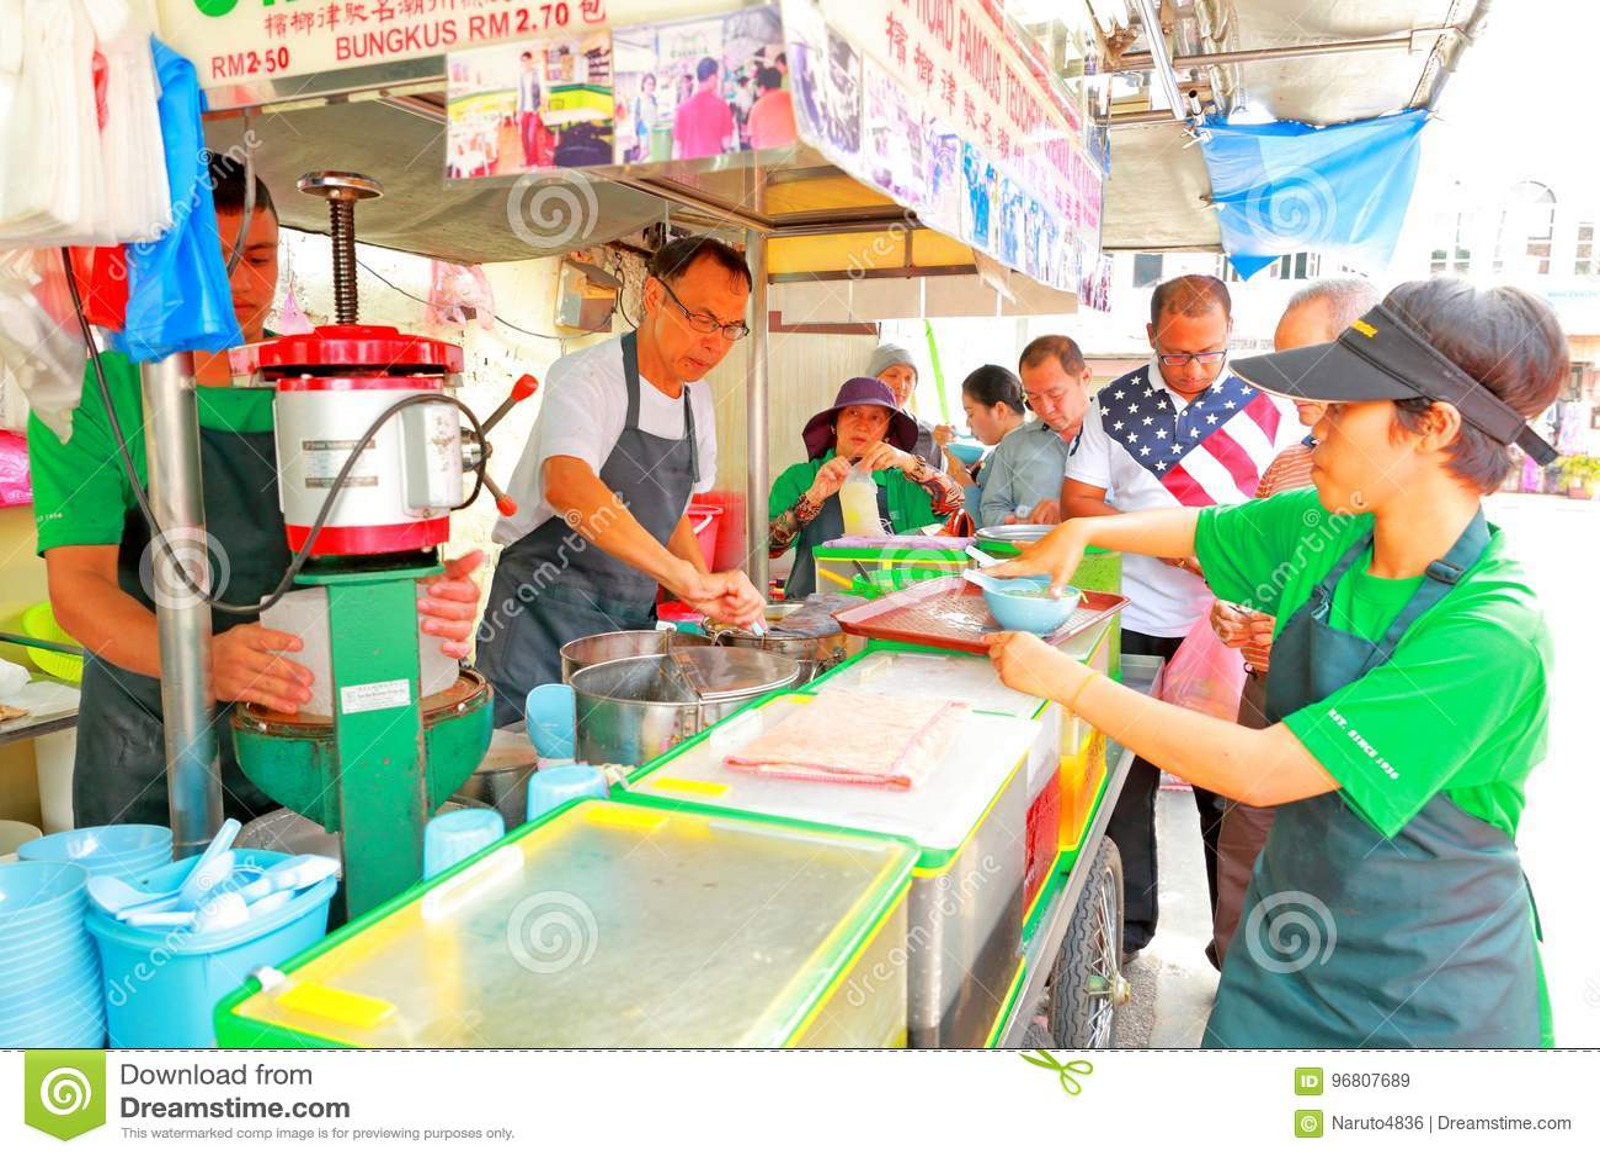 Street Food In Malaysia Penang Editorial Stock Image - Image